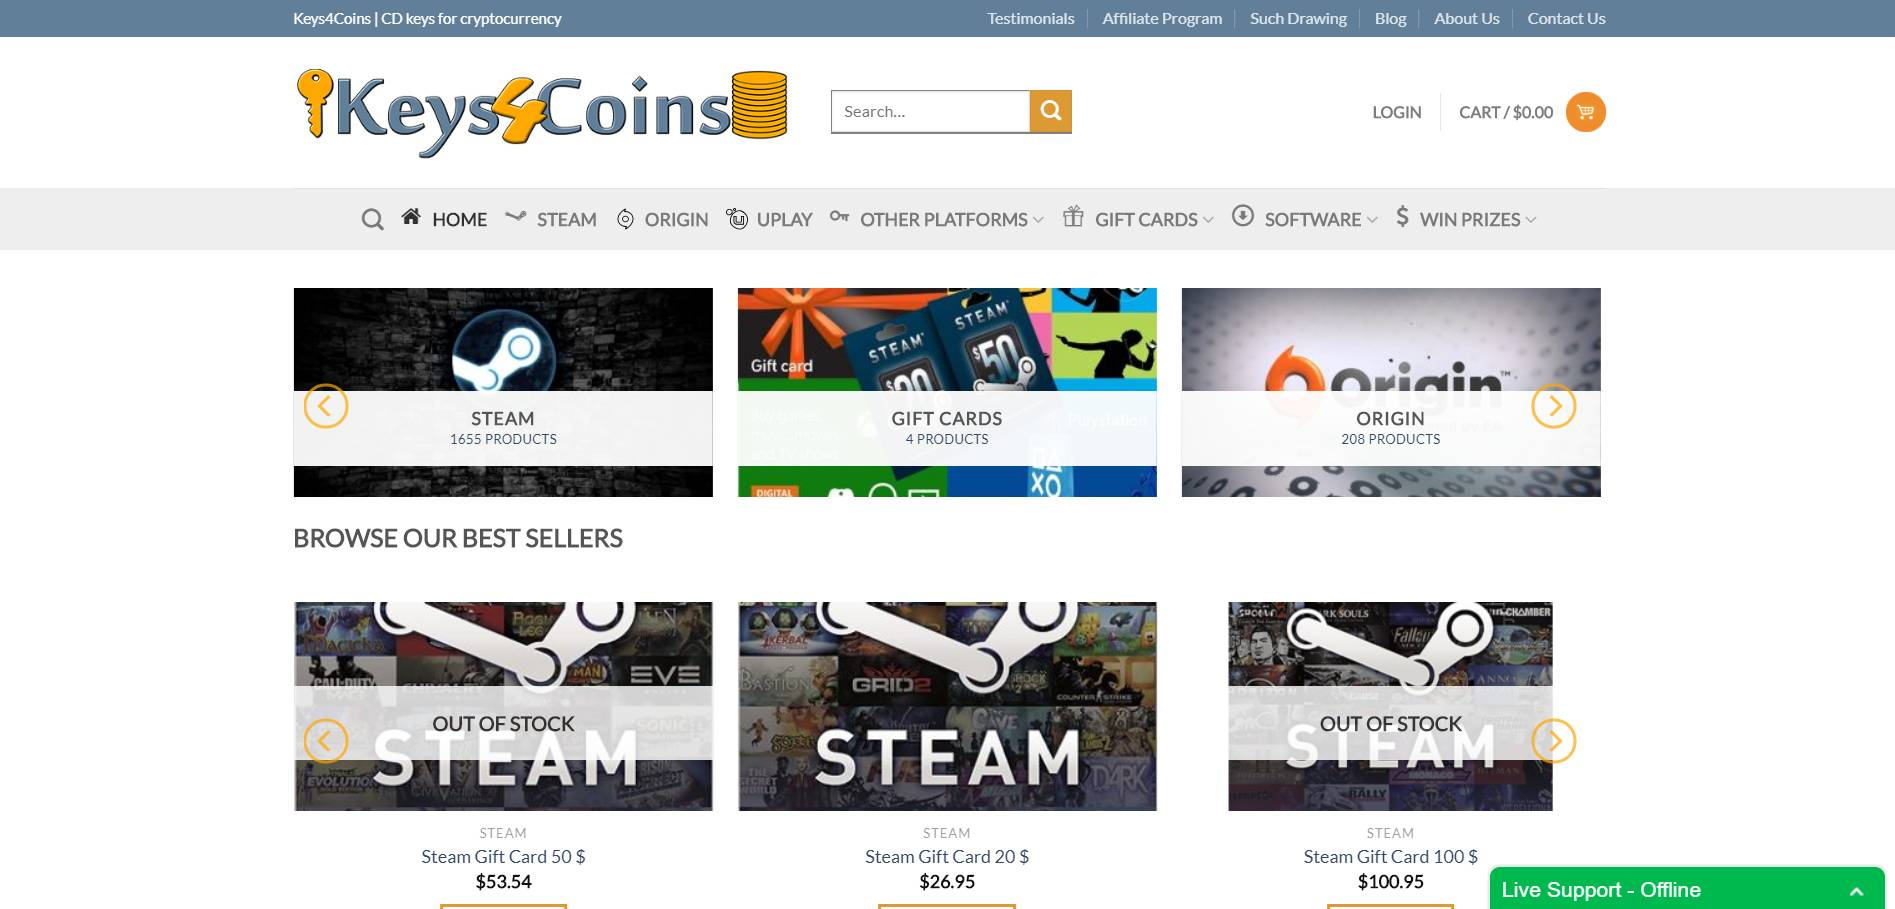 Keys4Coins